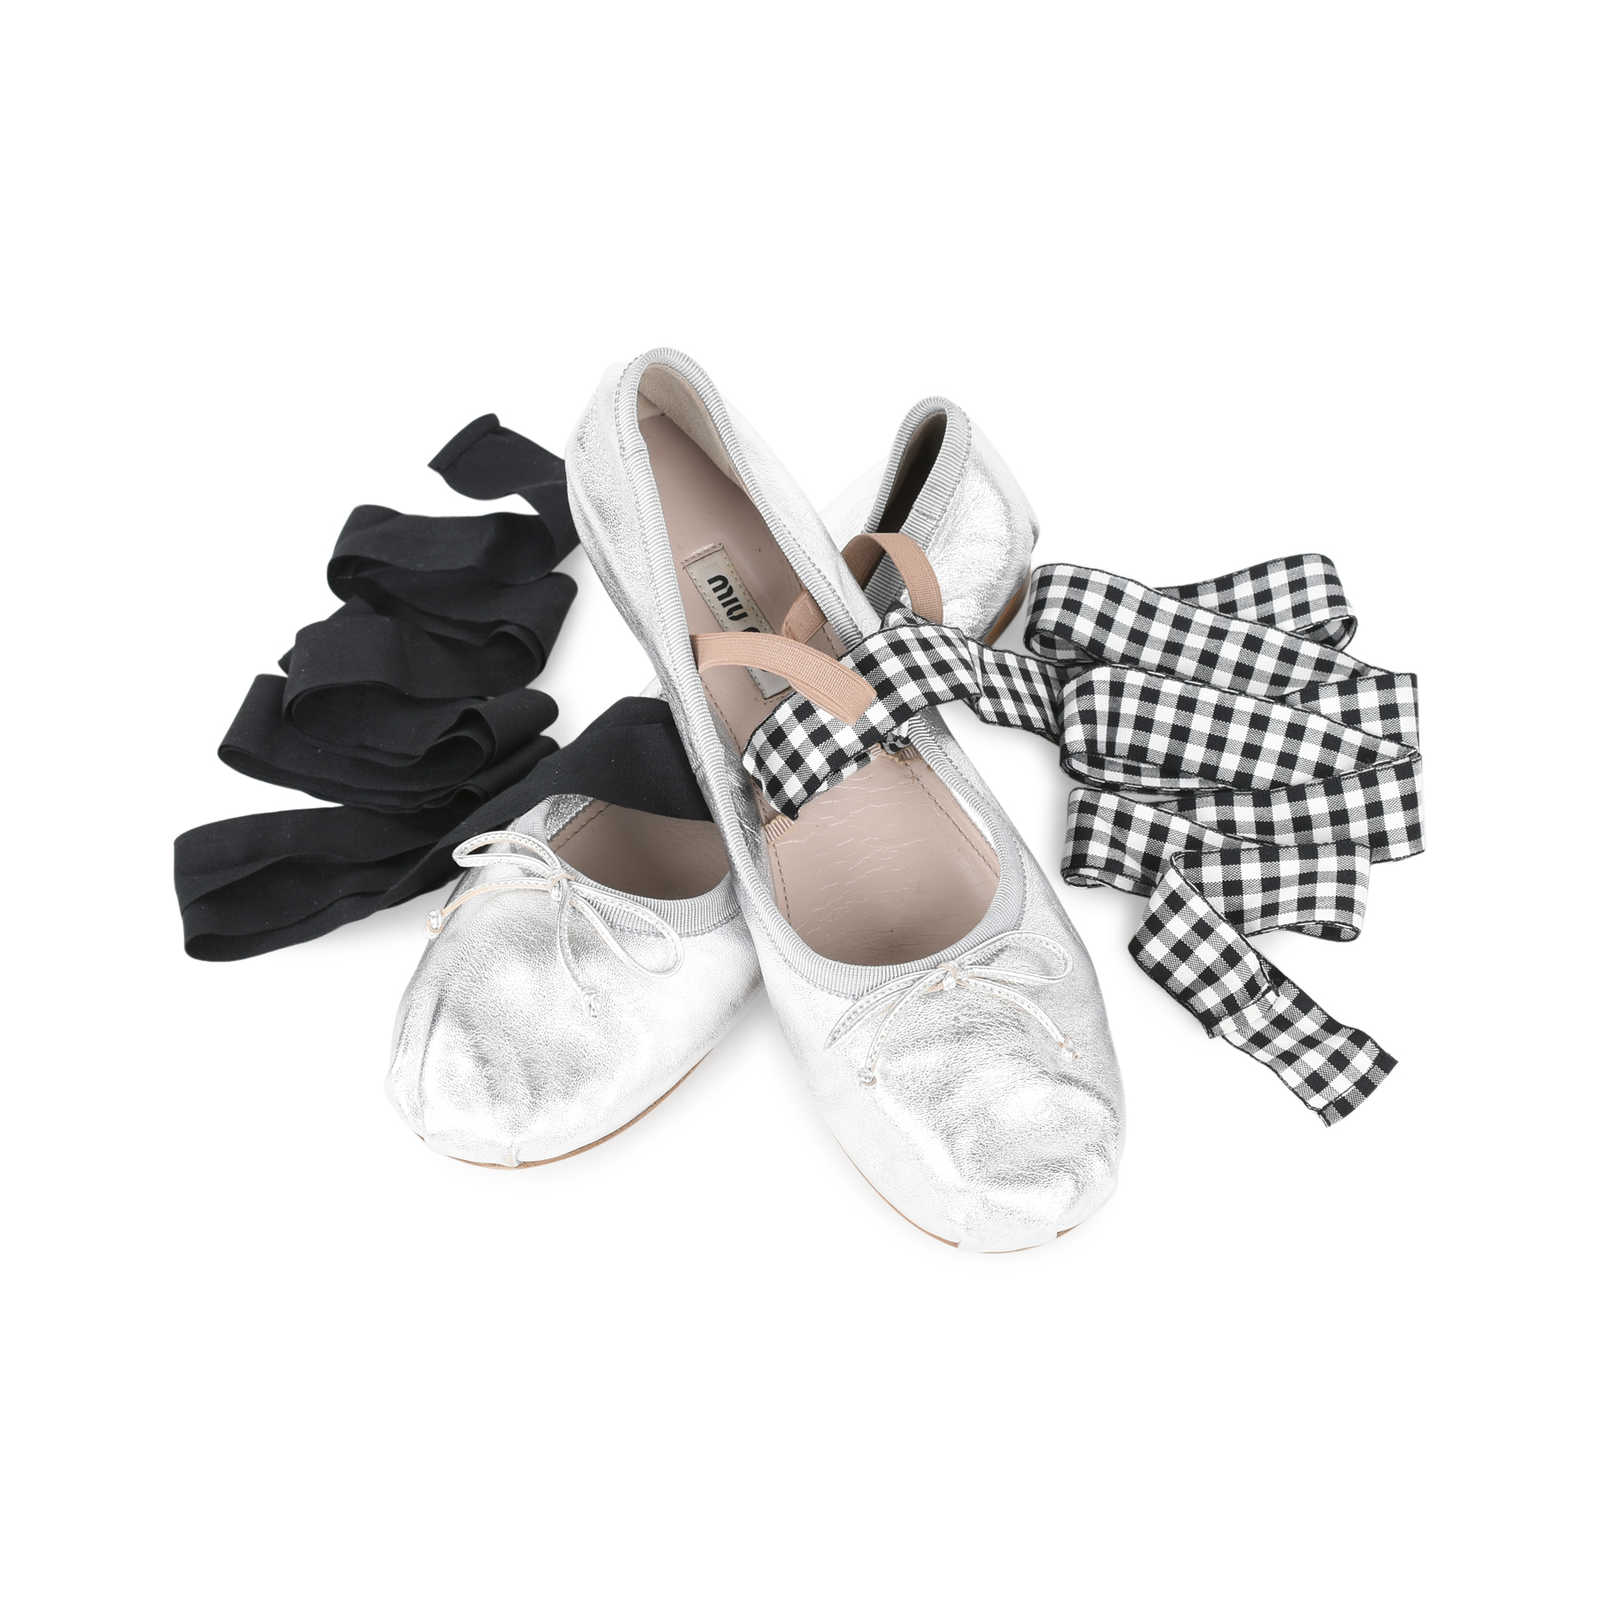 35e69881620 Authentic Second Hand Miu Miu Lace-Up Ballet Flats (PSS-200-01133 ...